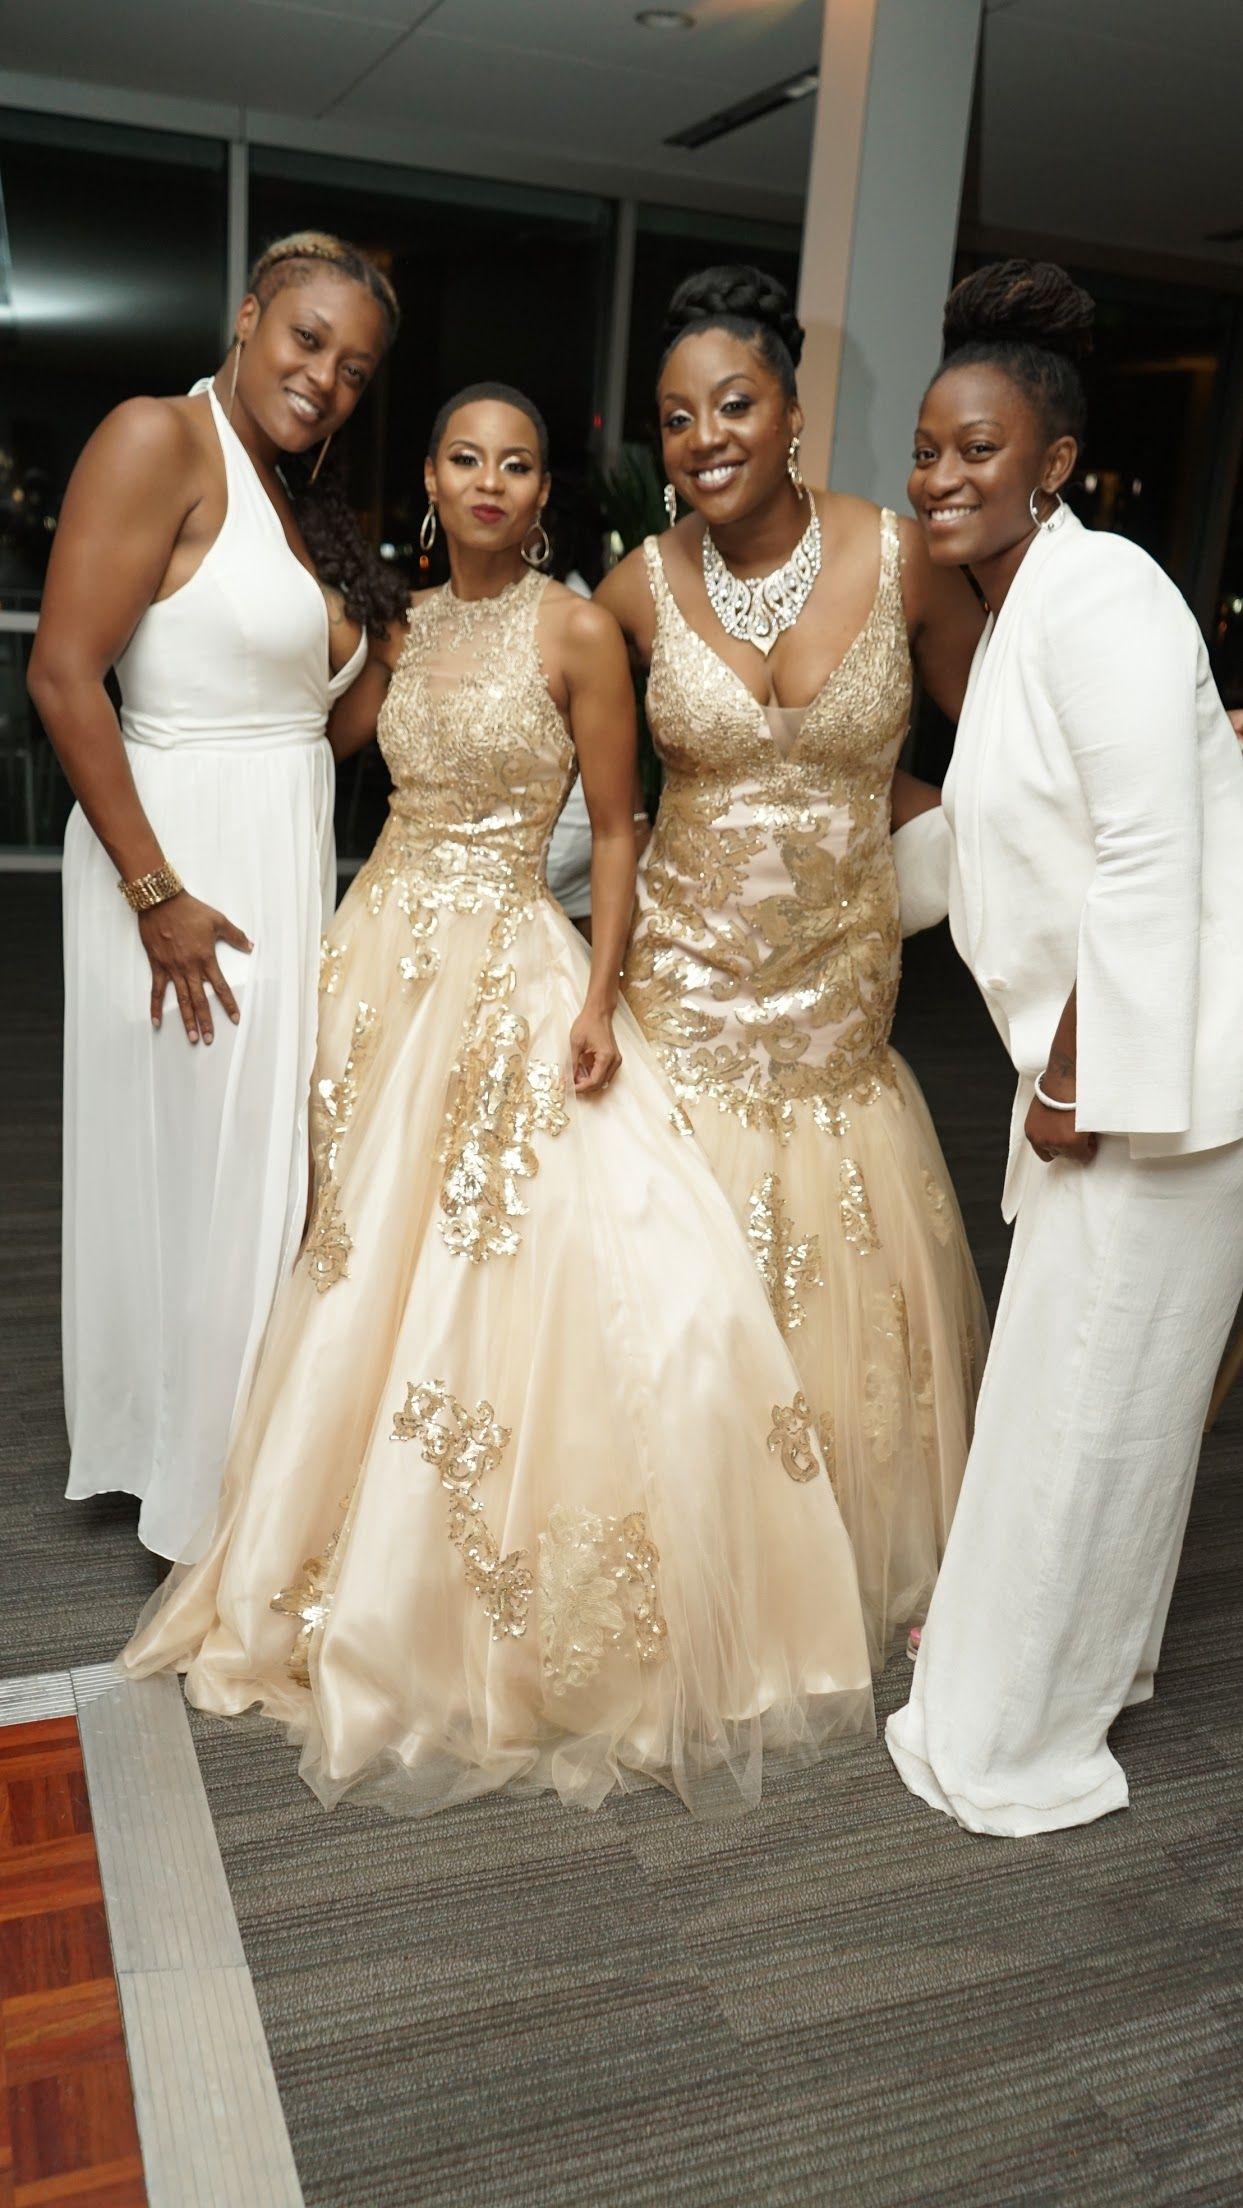 Black Lesbians, Lesbian Wedding